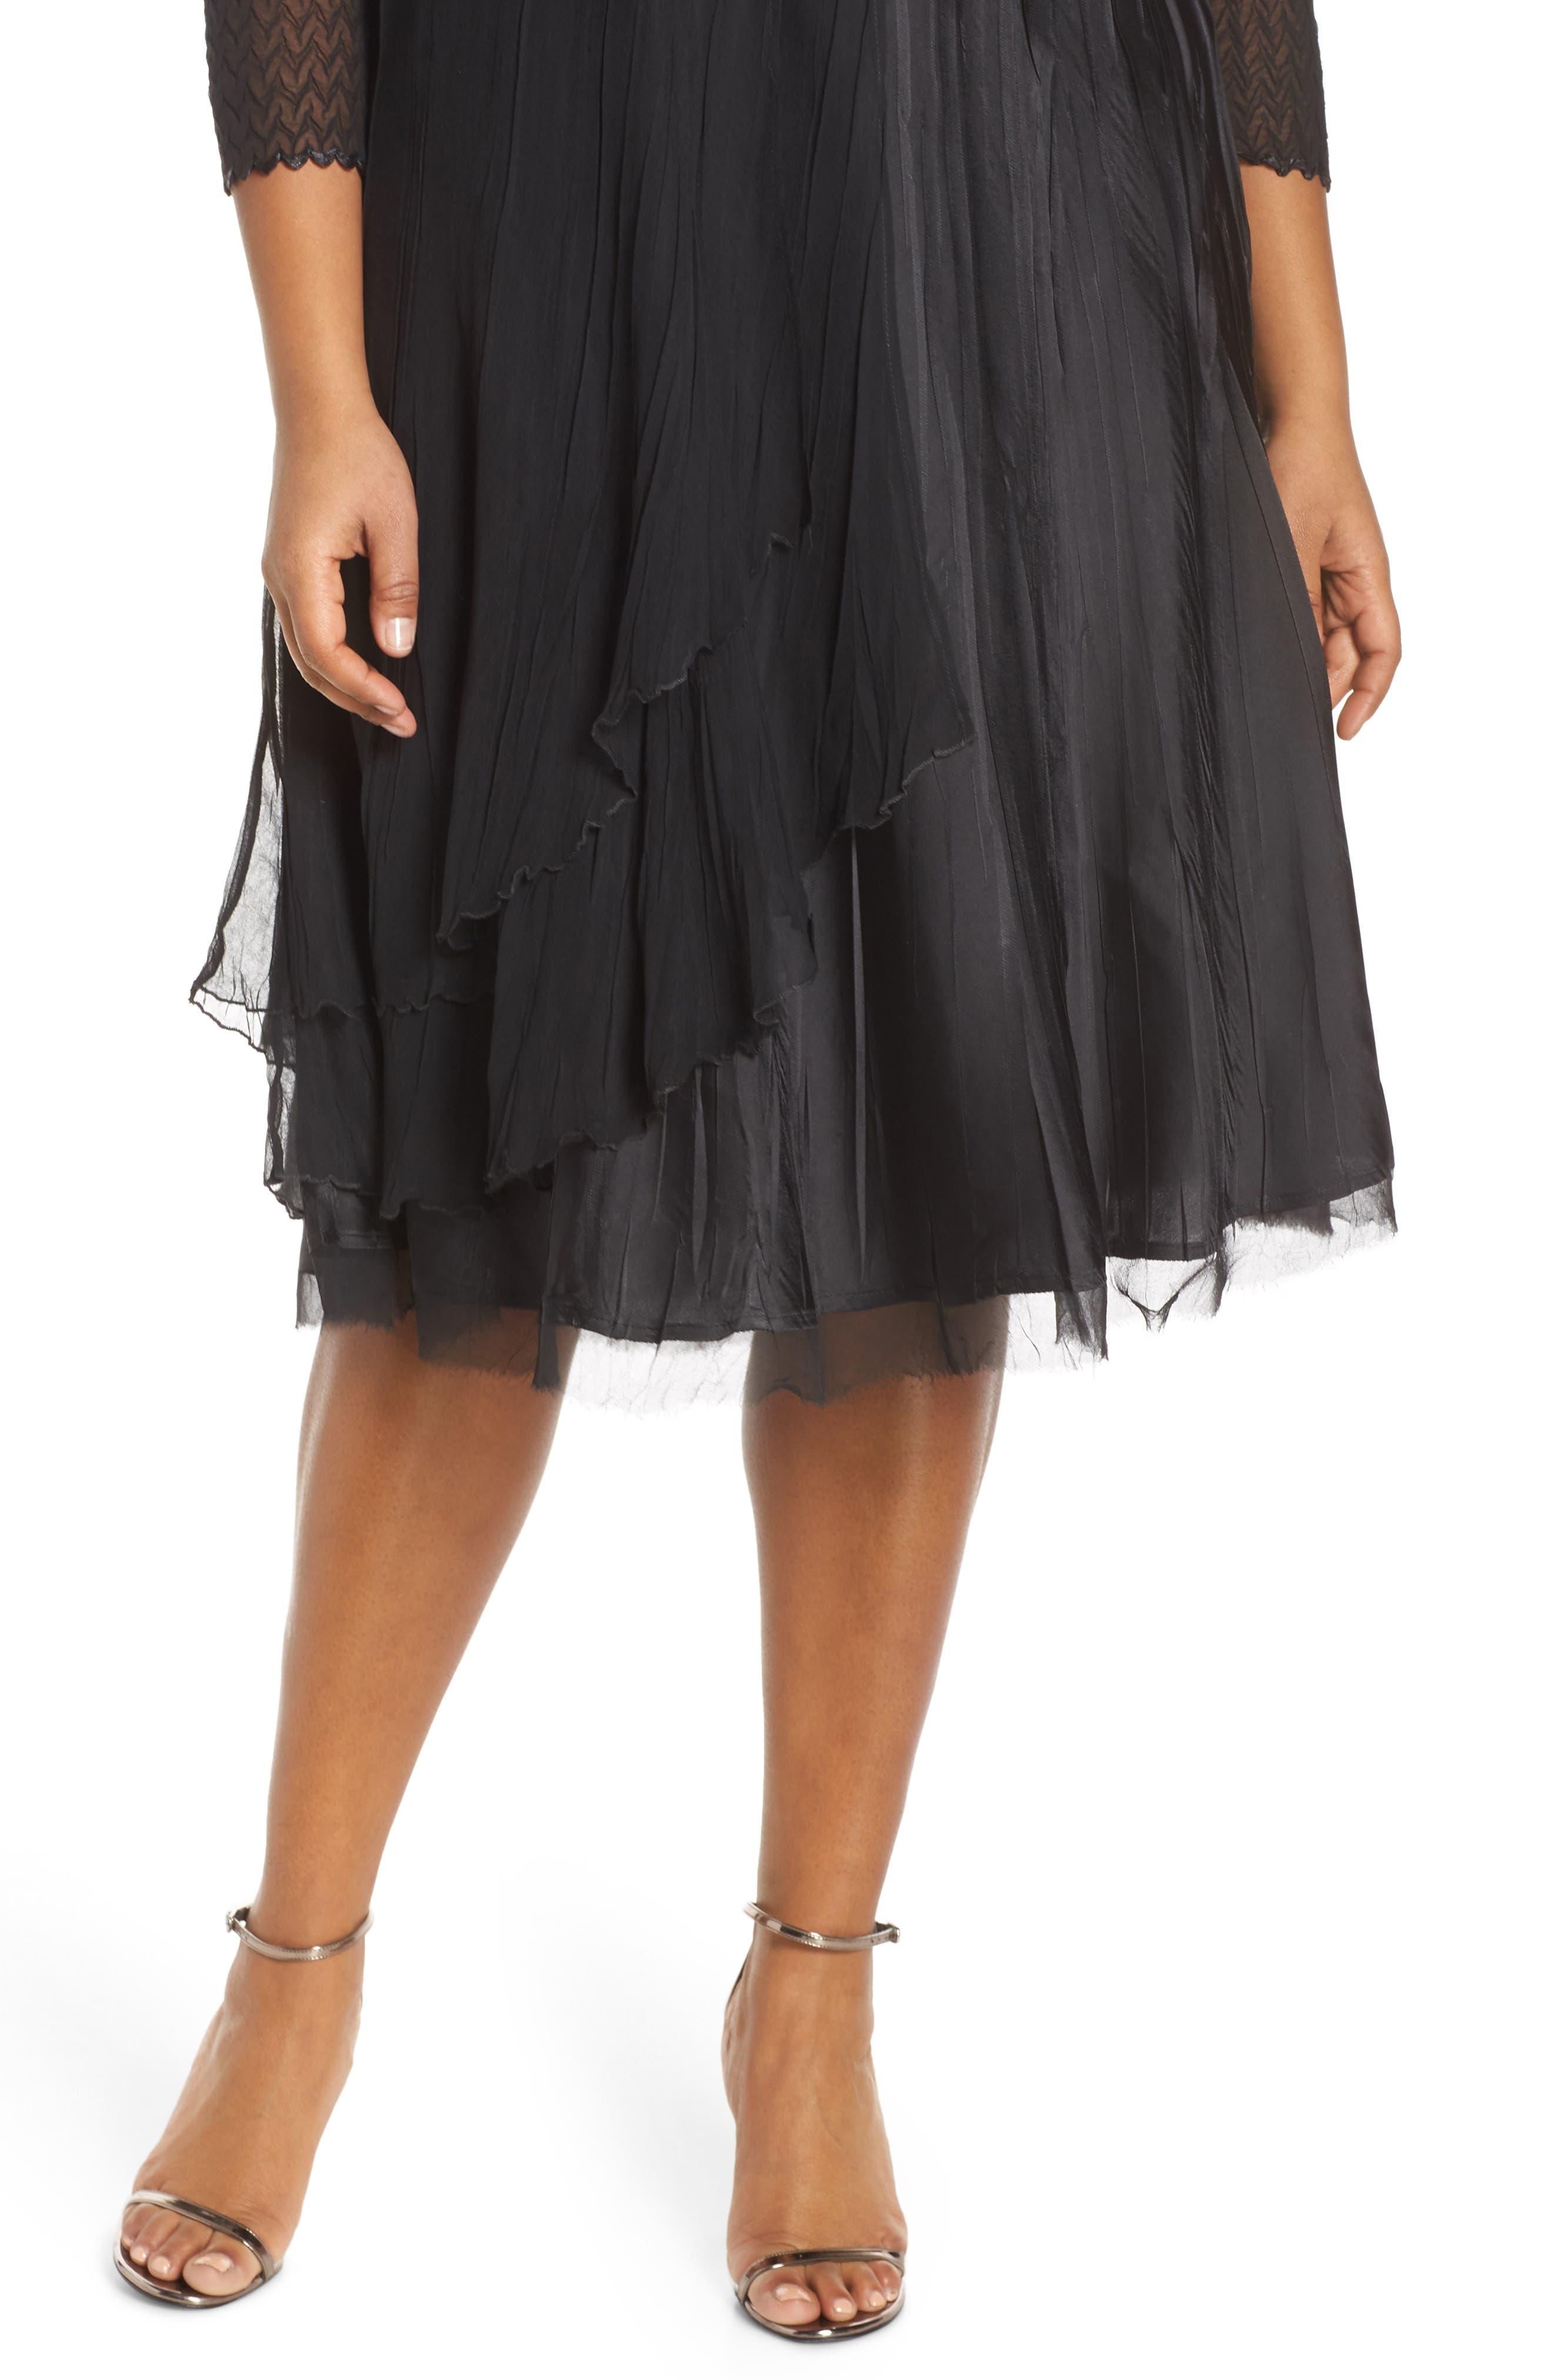 KOMAROV, Beaded Neck Chiffon Dress, Alternate thumbnail 5, color, 001